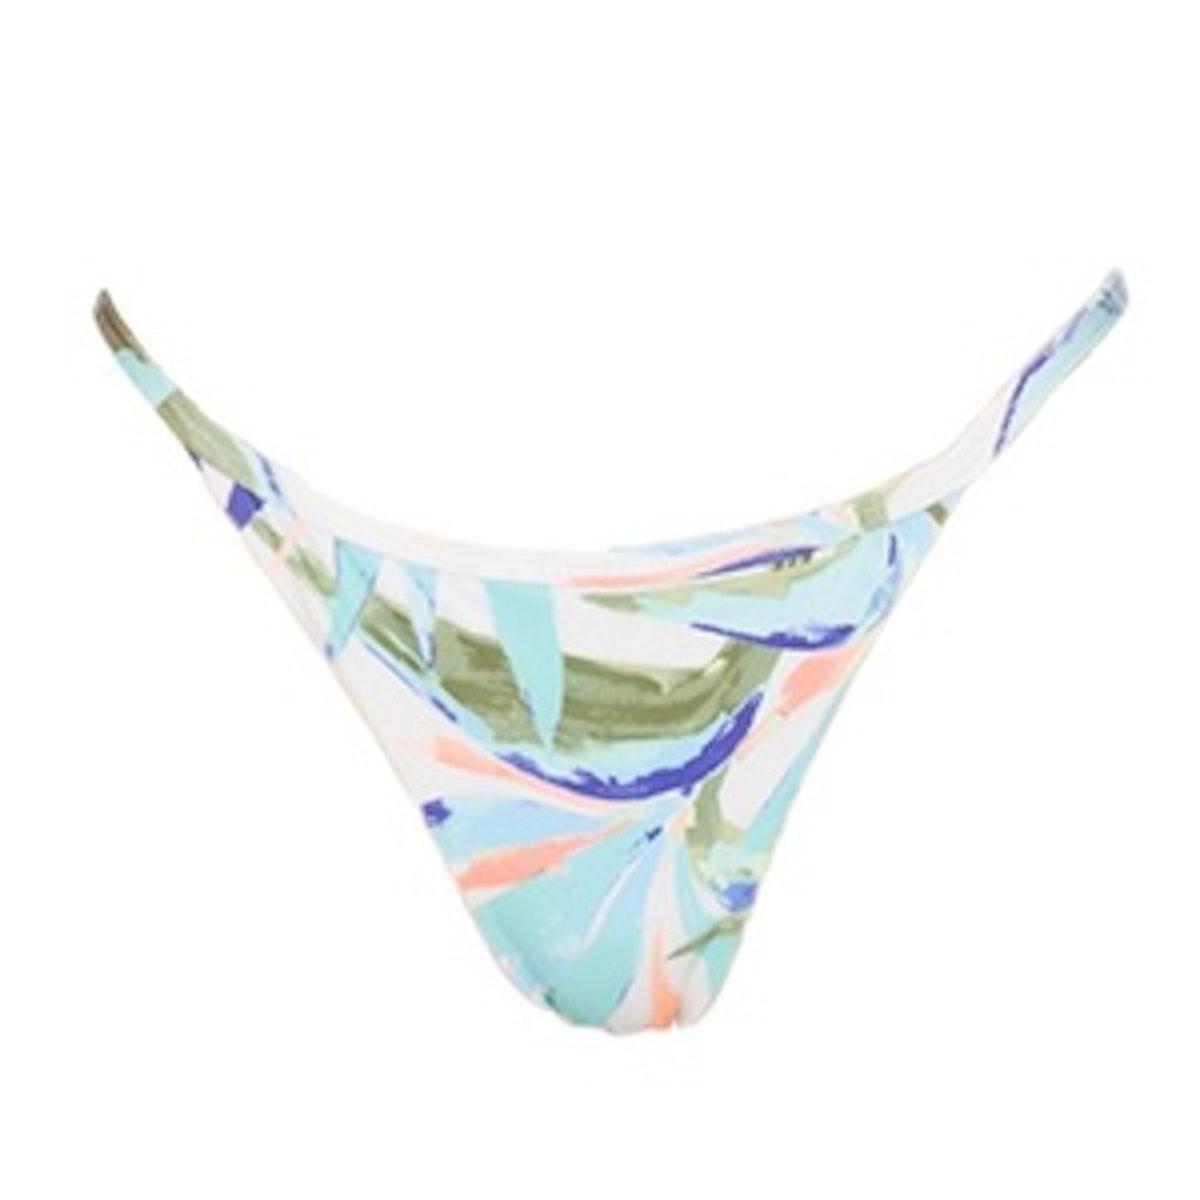 Brave High Leg String Bikini Bottom